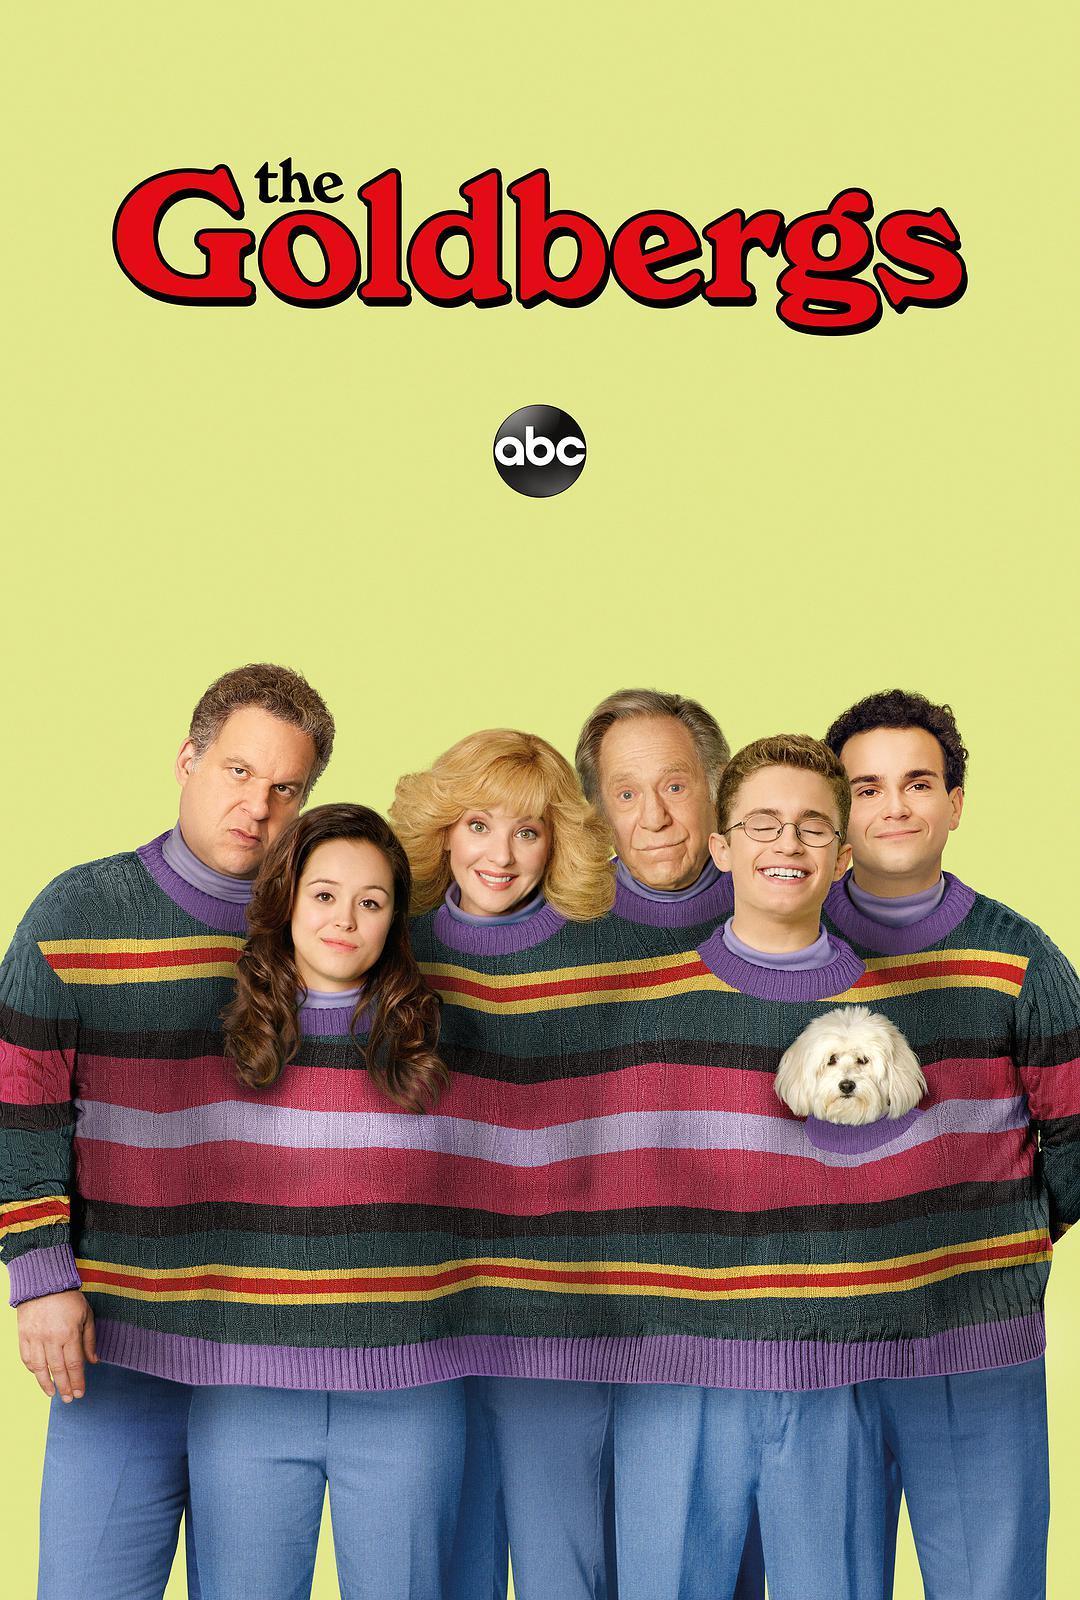 The Goldbergs Season 7